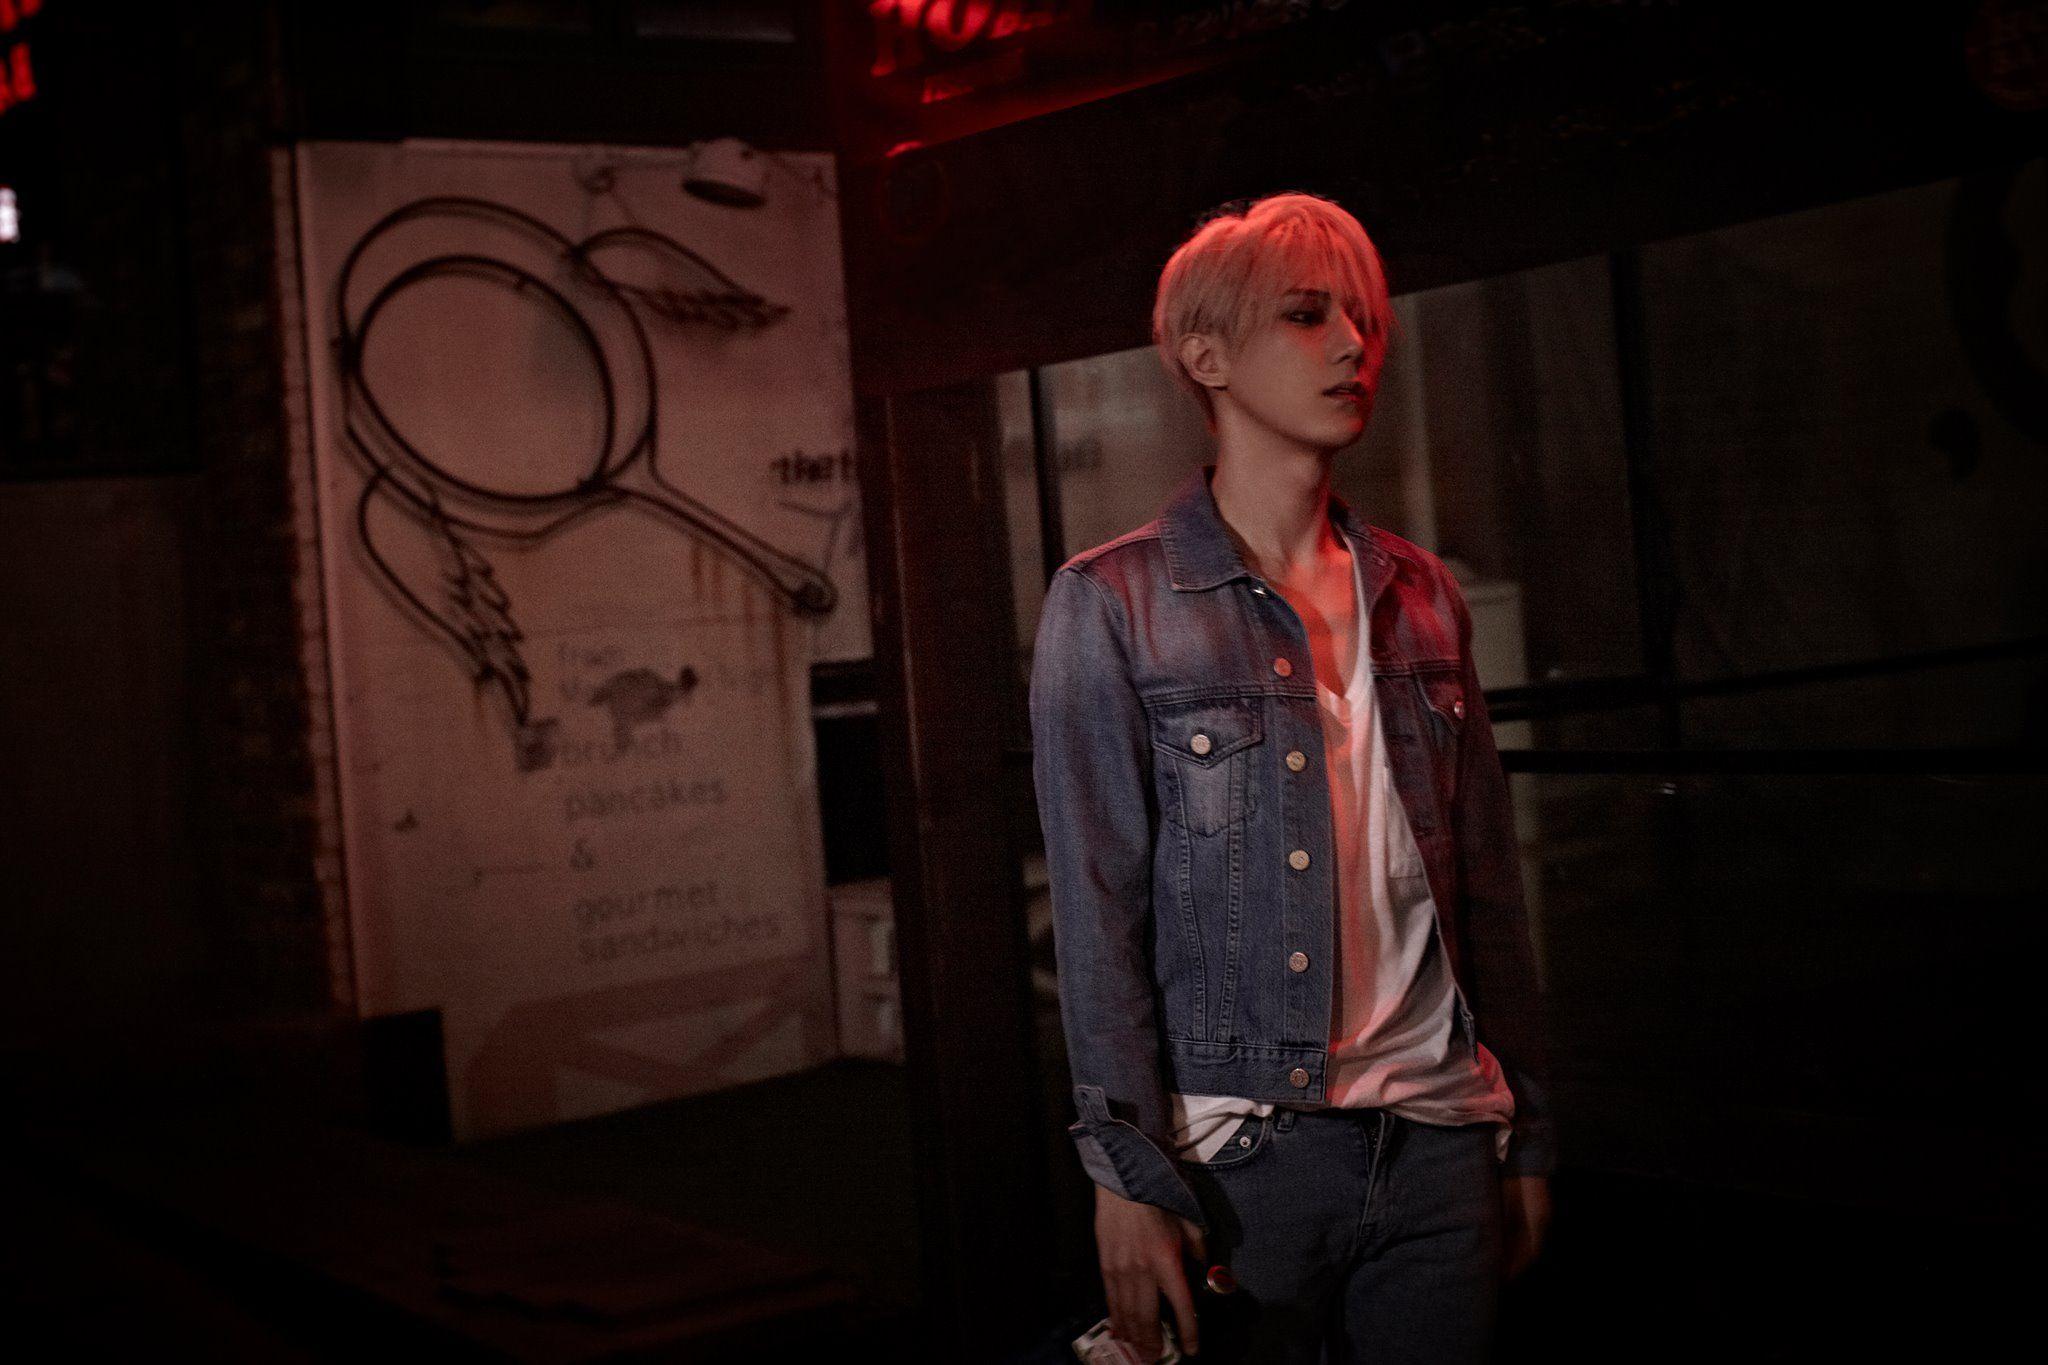 Jang Hyunseung 1st Mini Album 'MY' Teaser Image #장현승 #Jang_Hyunseung of #비스트 #BEAST  #Title song #니가처음이야 #Ma_First